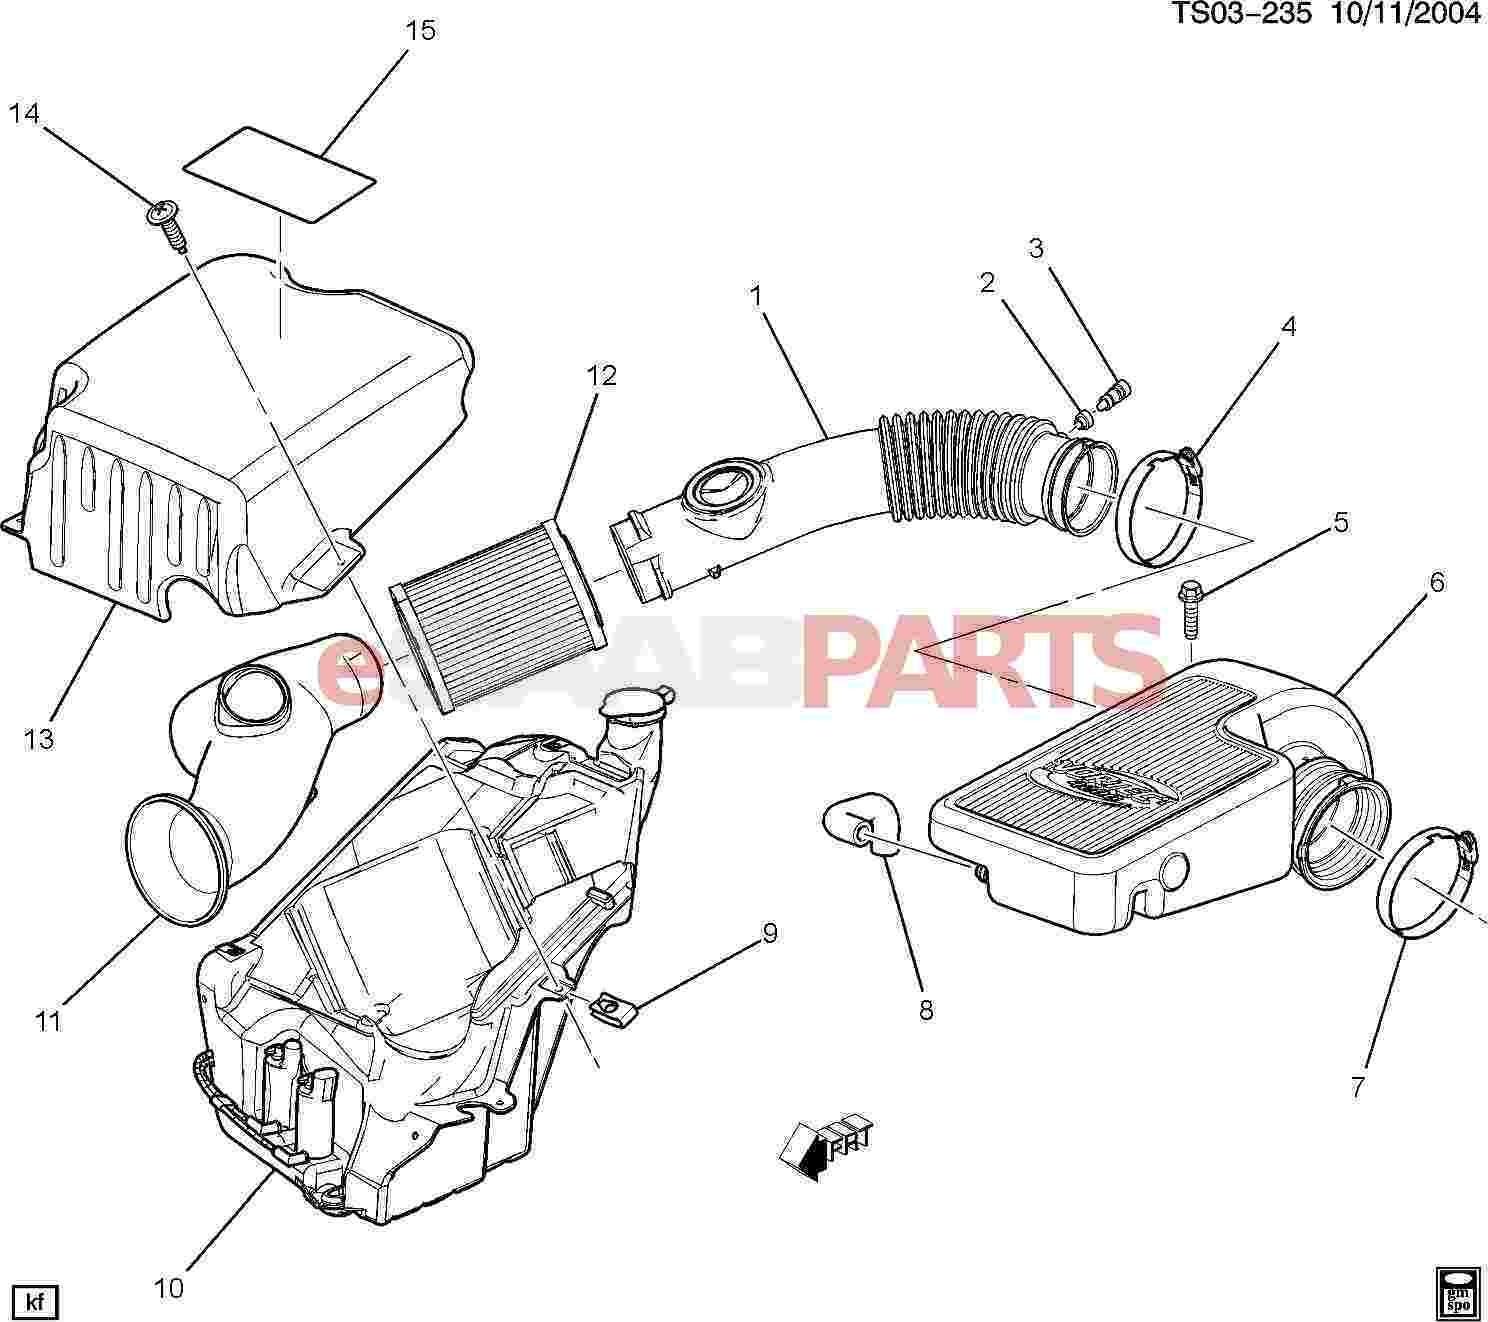 Air Intake System Diagram Esaabparts Saab 9 7x Engine Parts Air Filters & Related Of Air Intake System Diagram